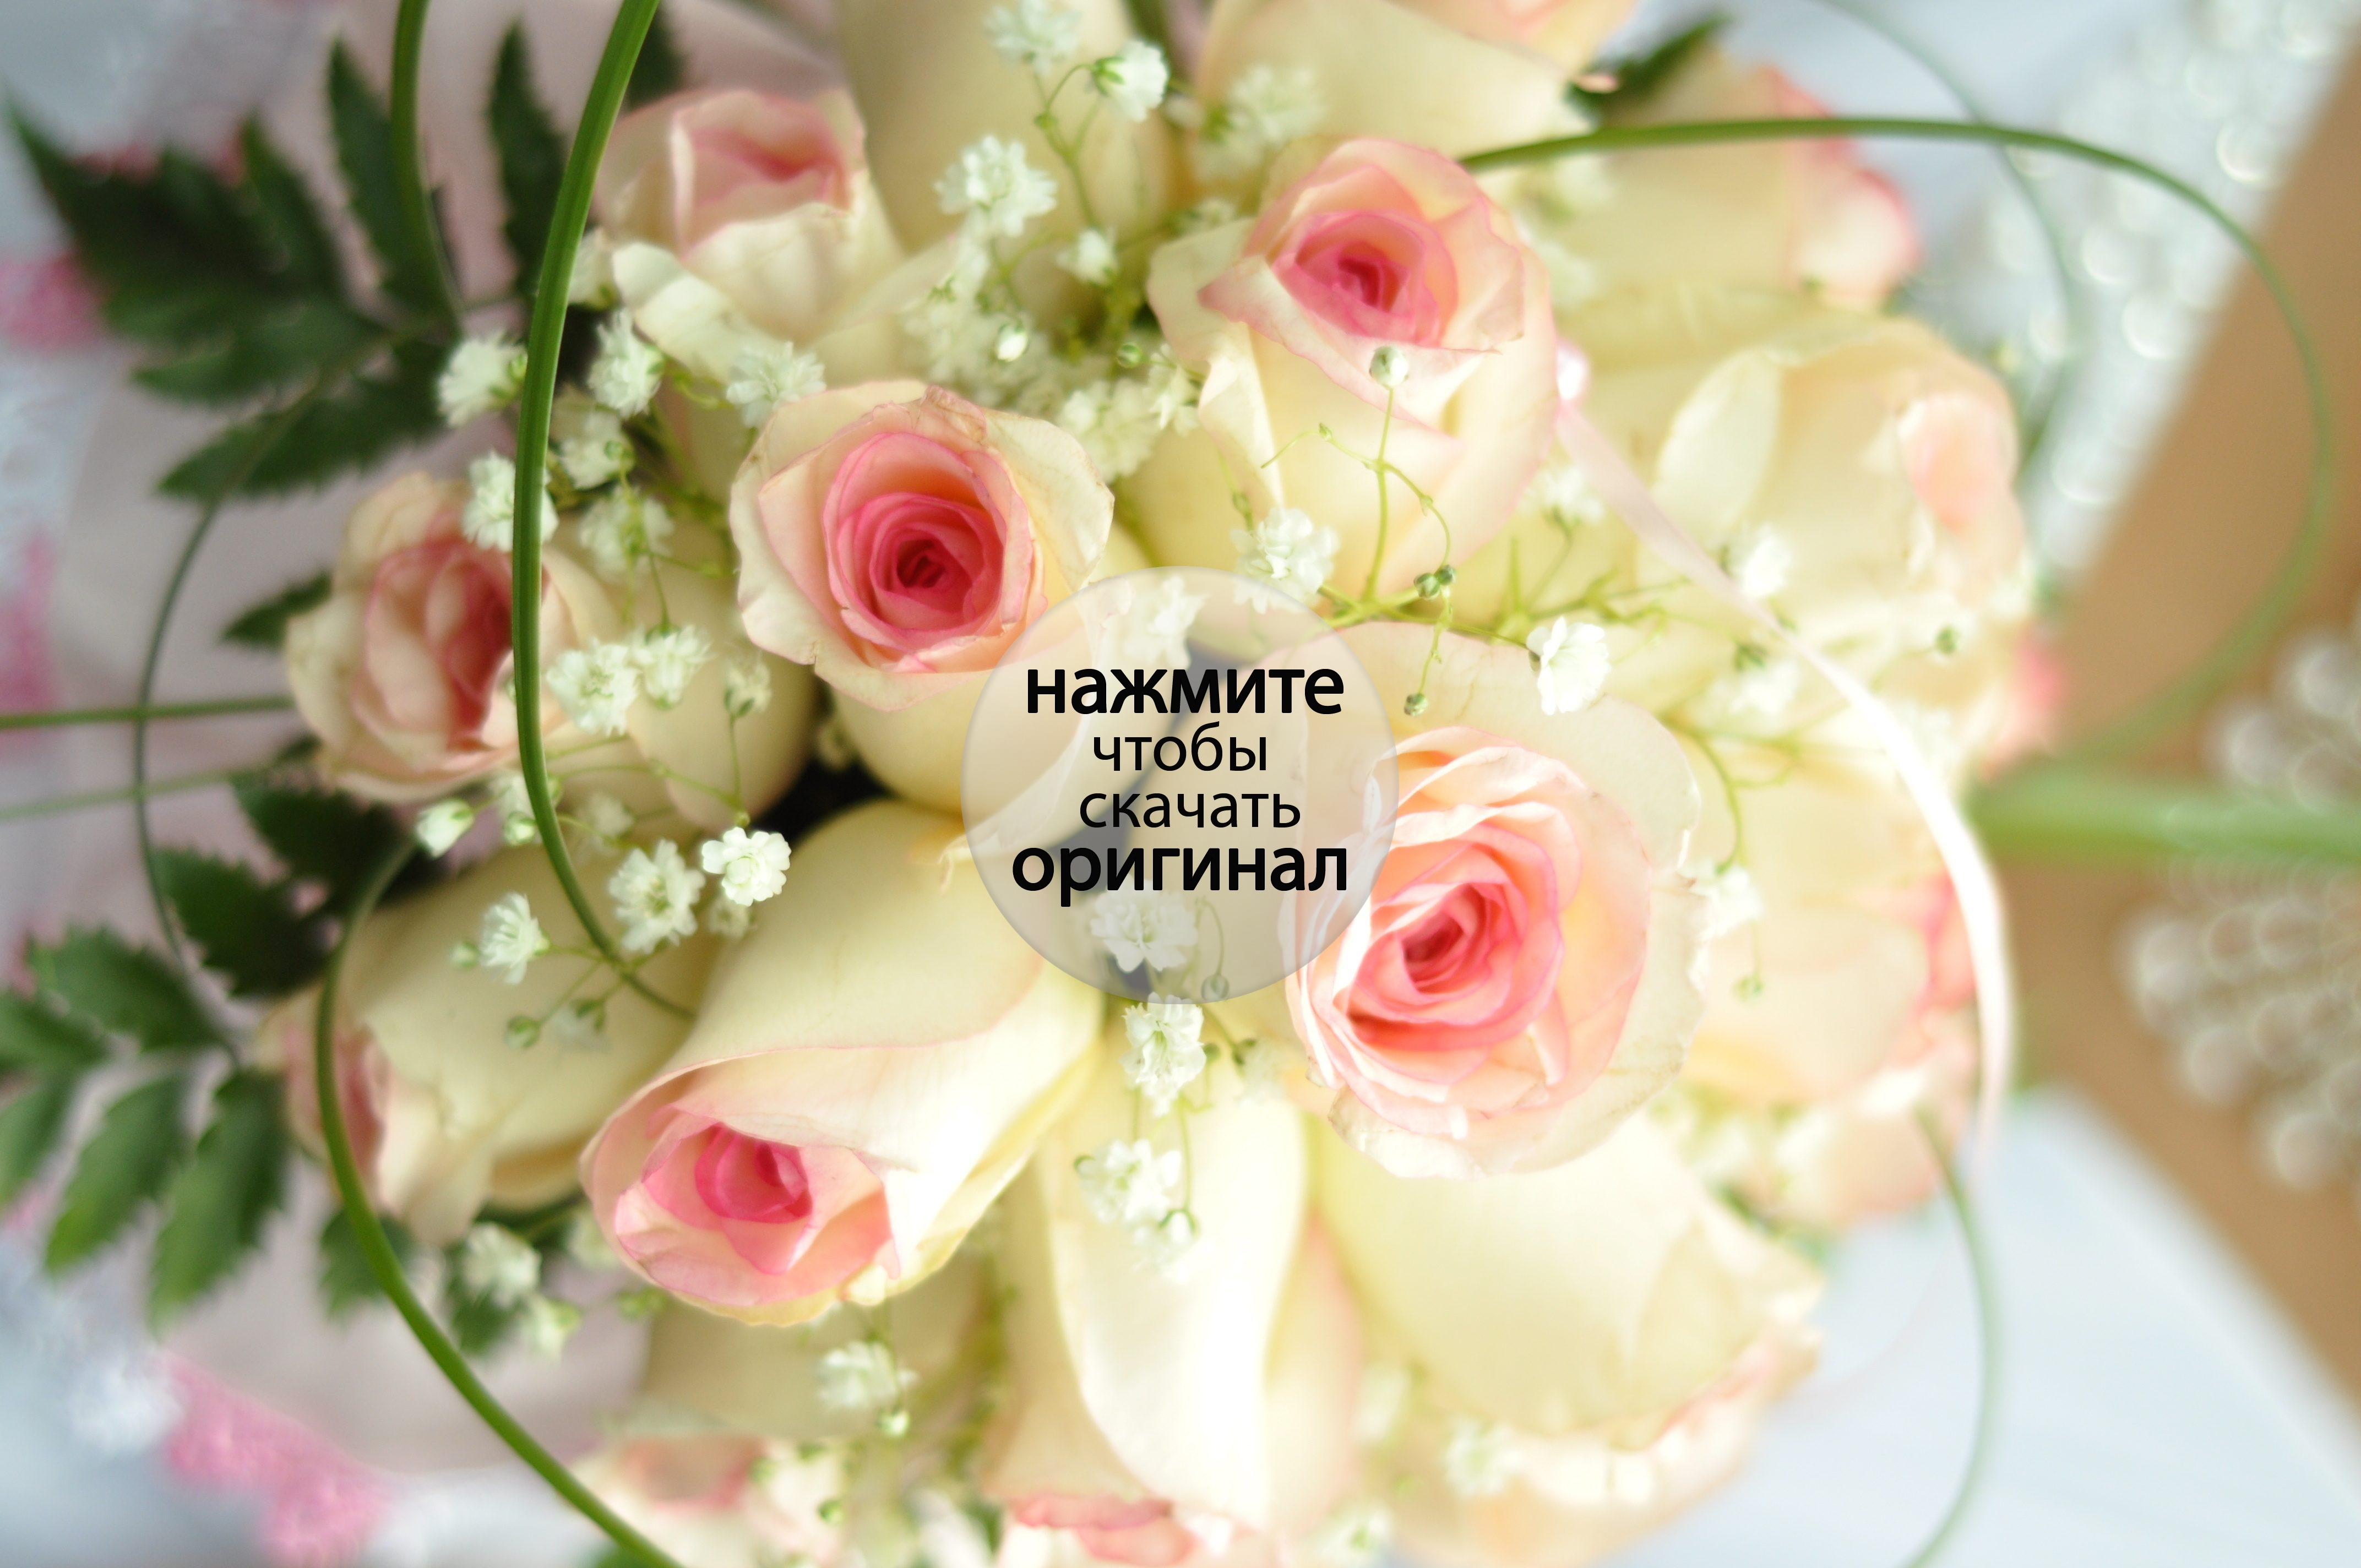 Бежевые цветы